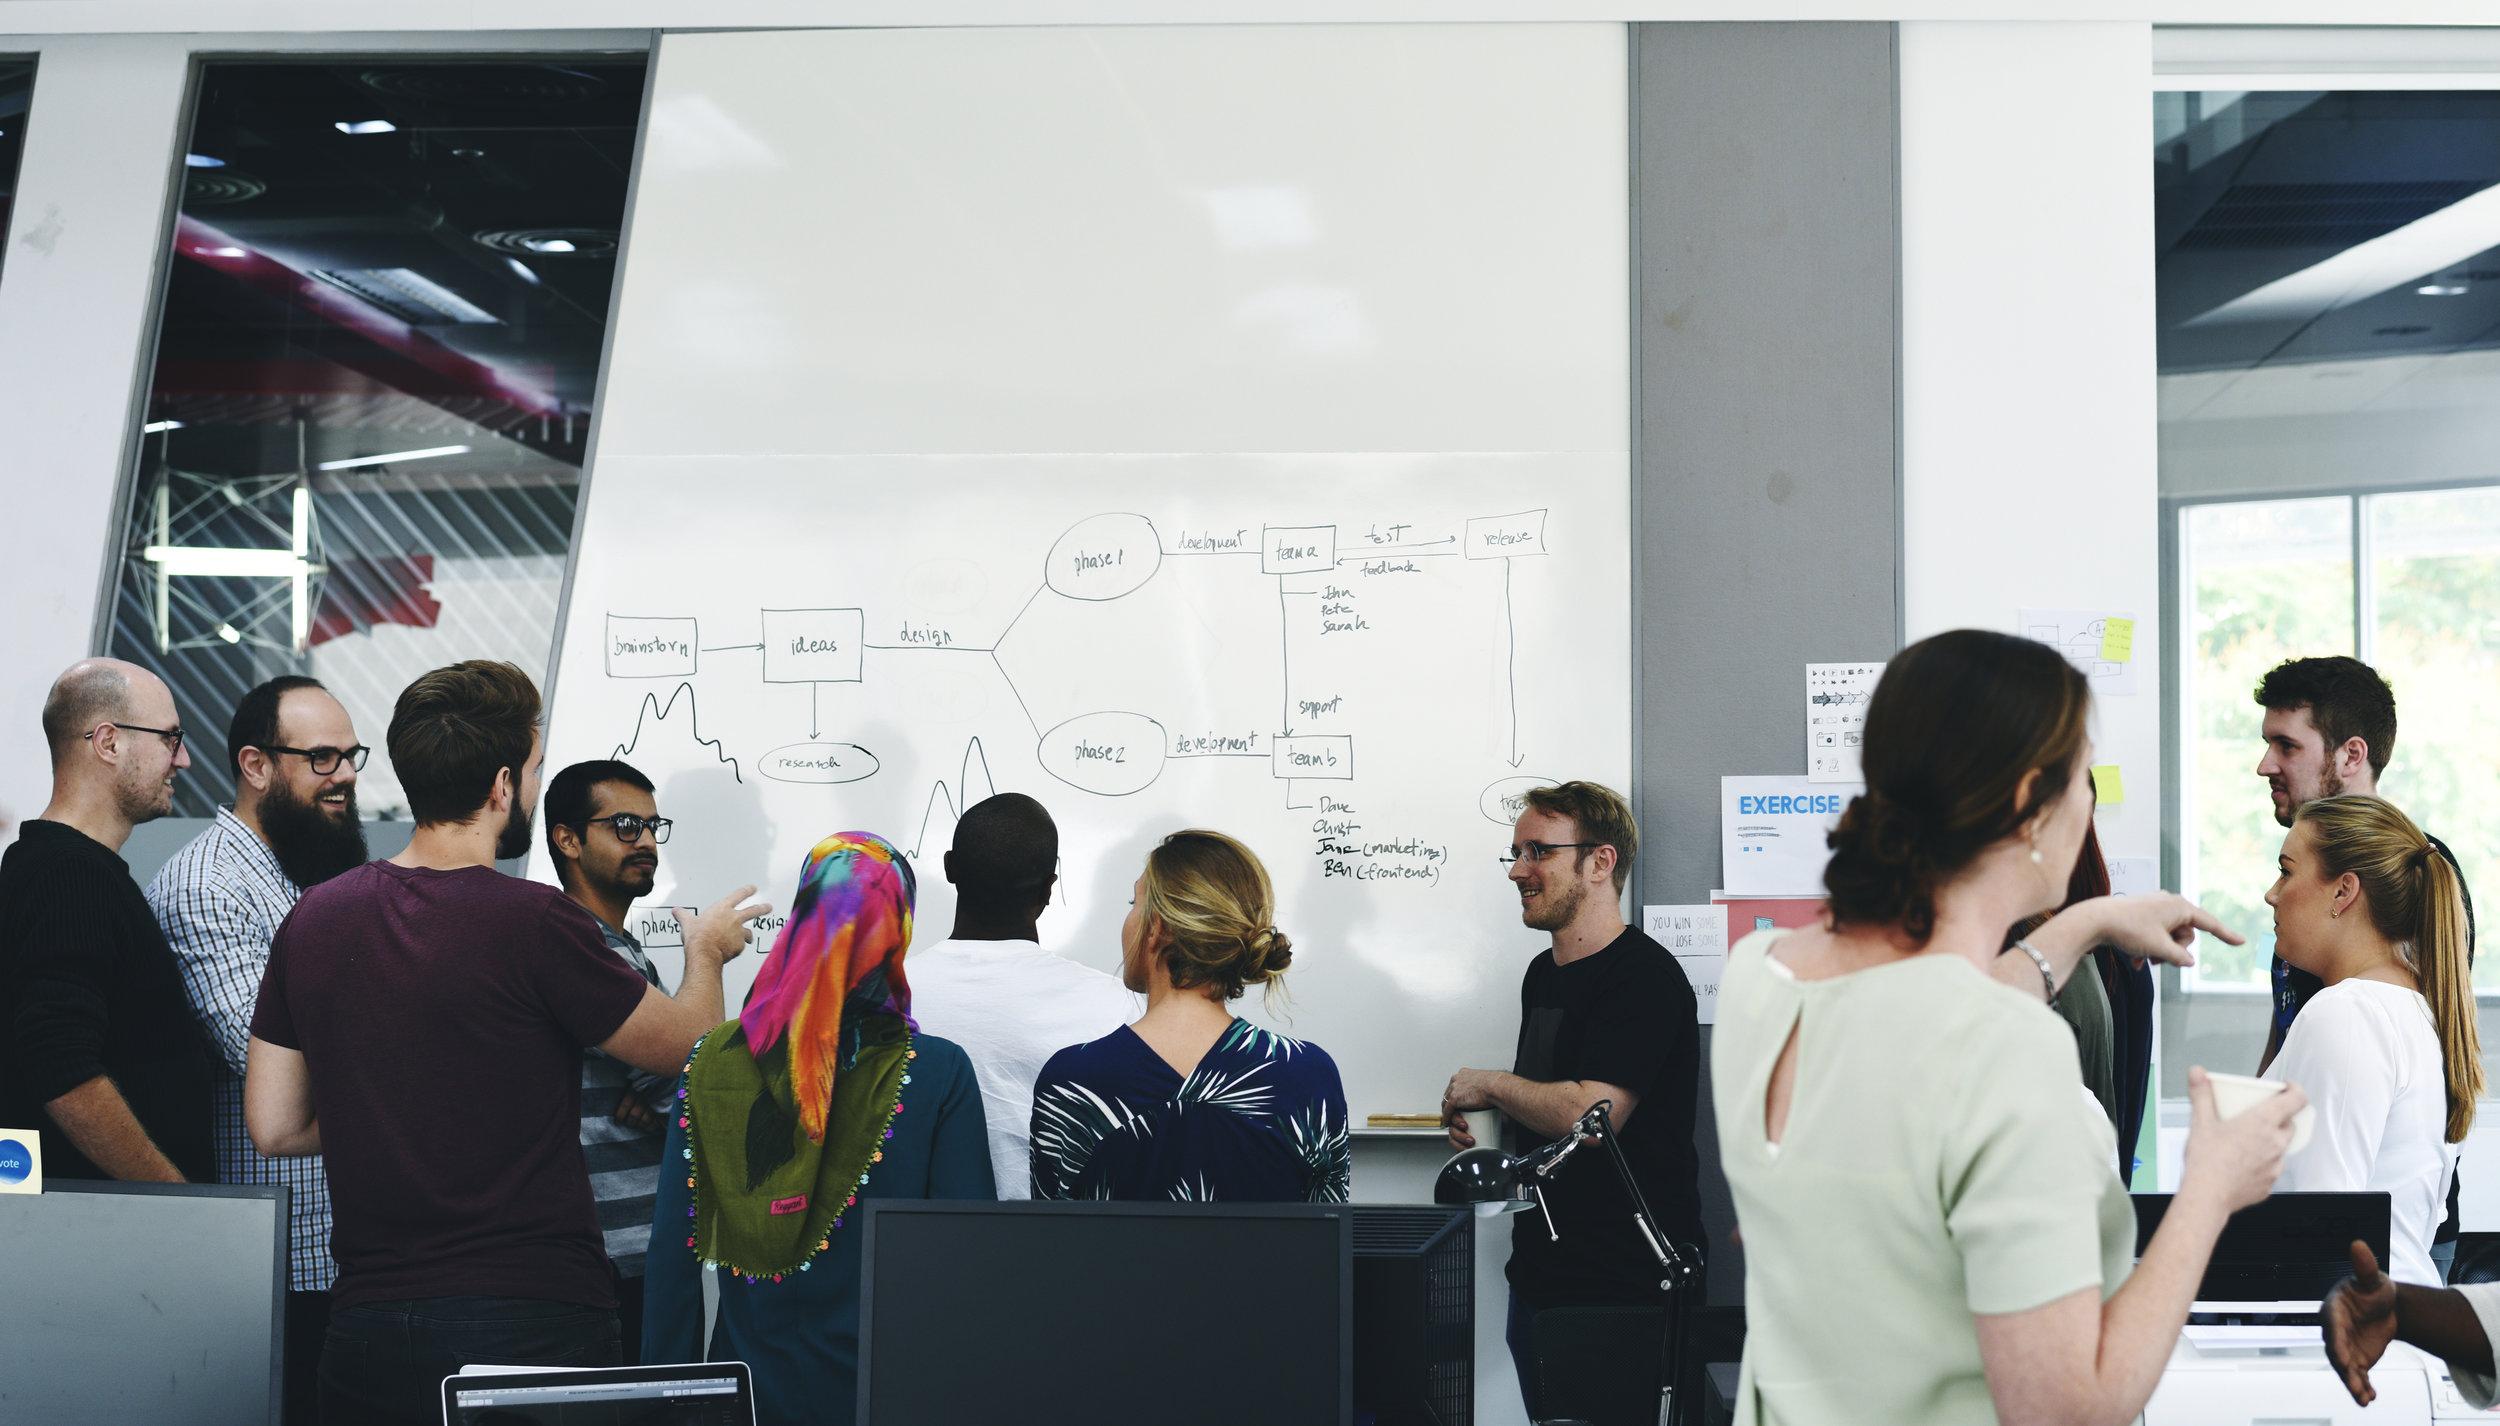 startup-business-team-brainstorming-on-meeting-PTHCSKG.jpg